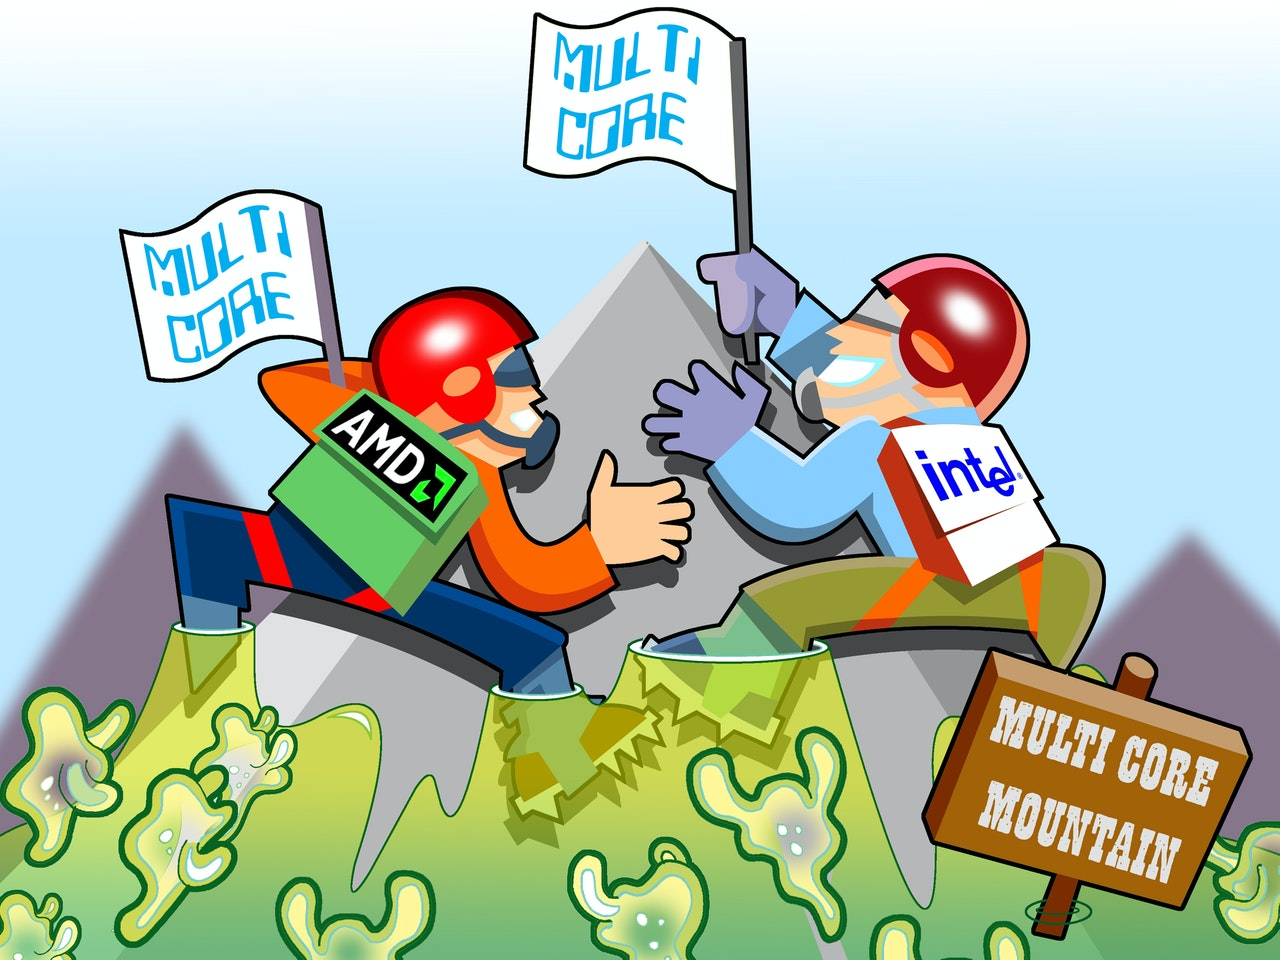 malware data hacking processor mountain climber amoeba virus funny happy humorous comical colourful graphic cartoon anime